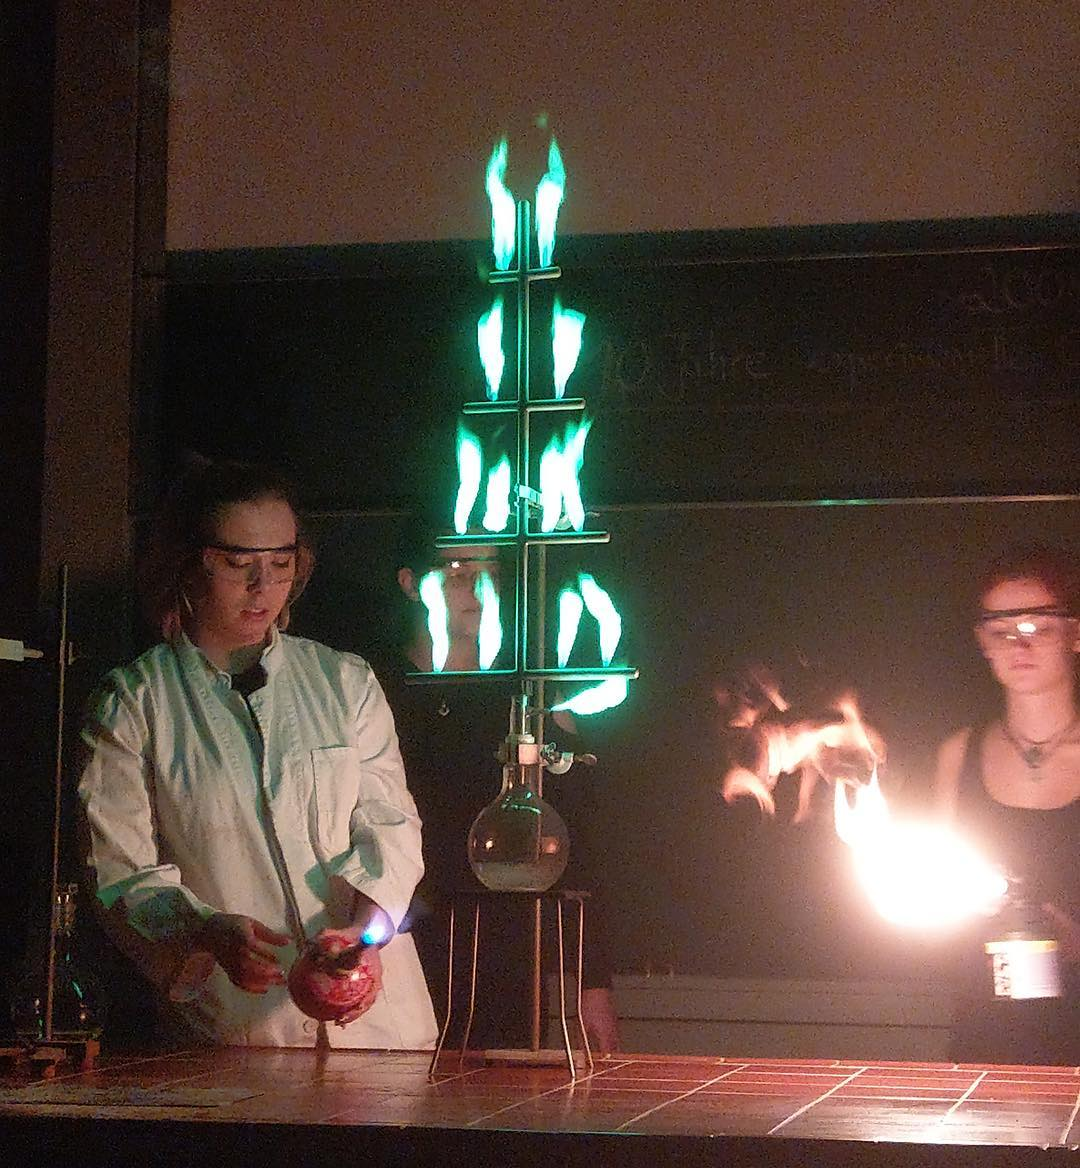 One hot Chemistree